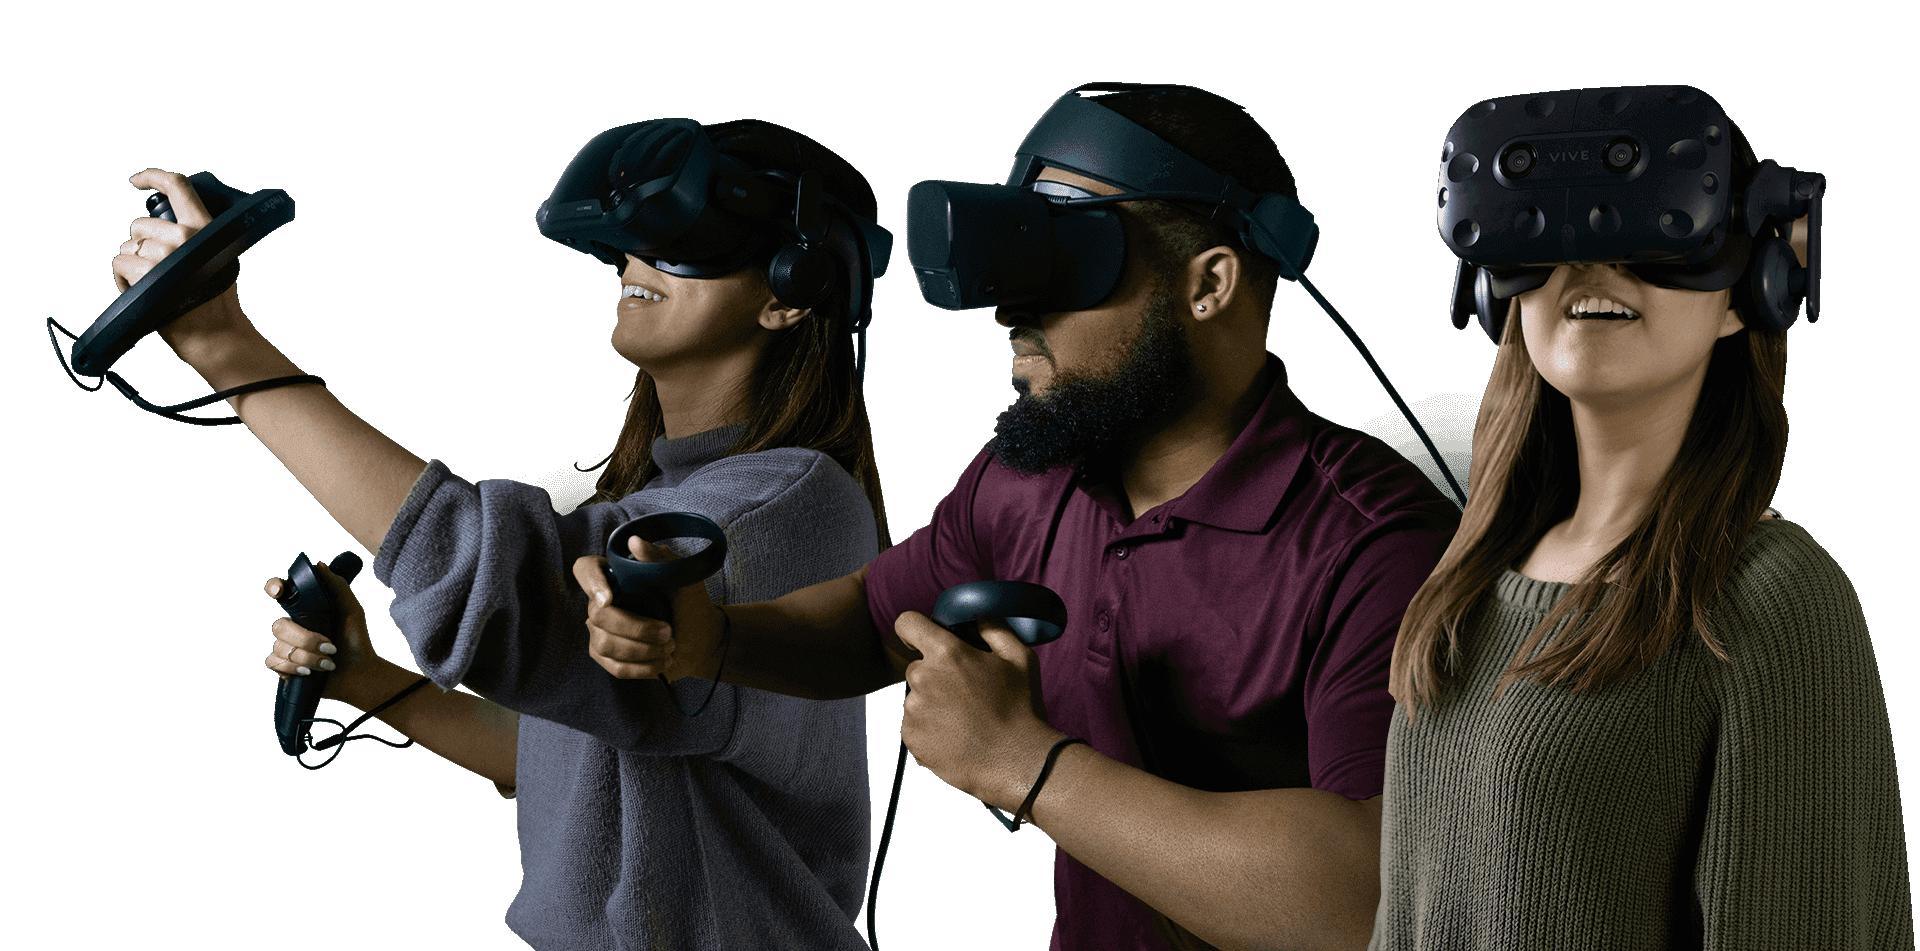 VIVE VR Support